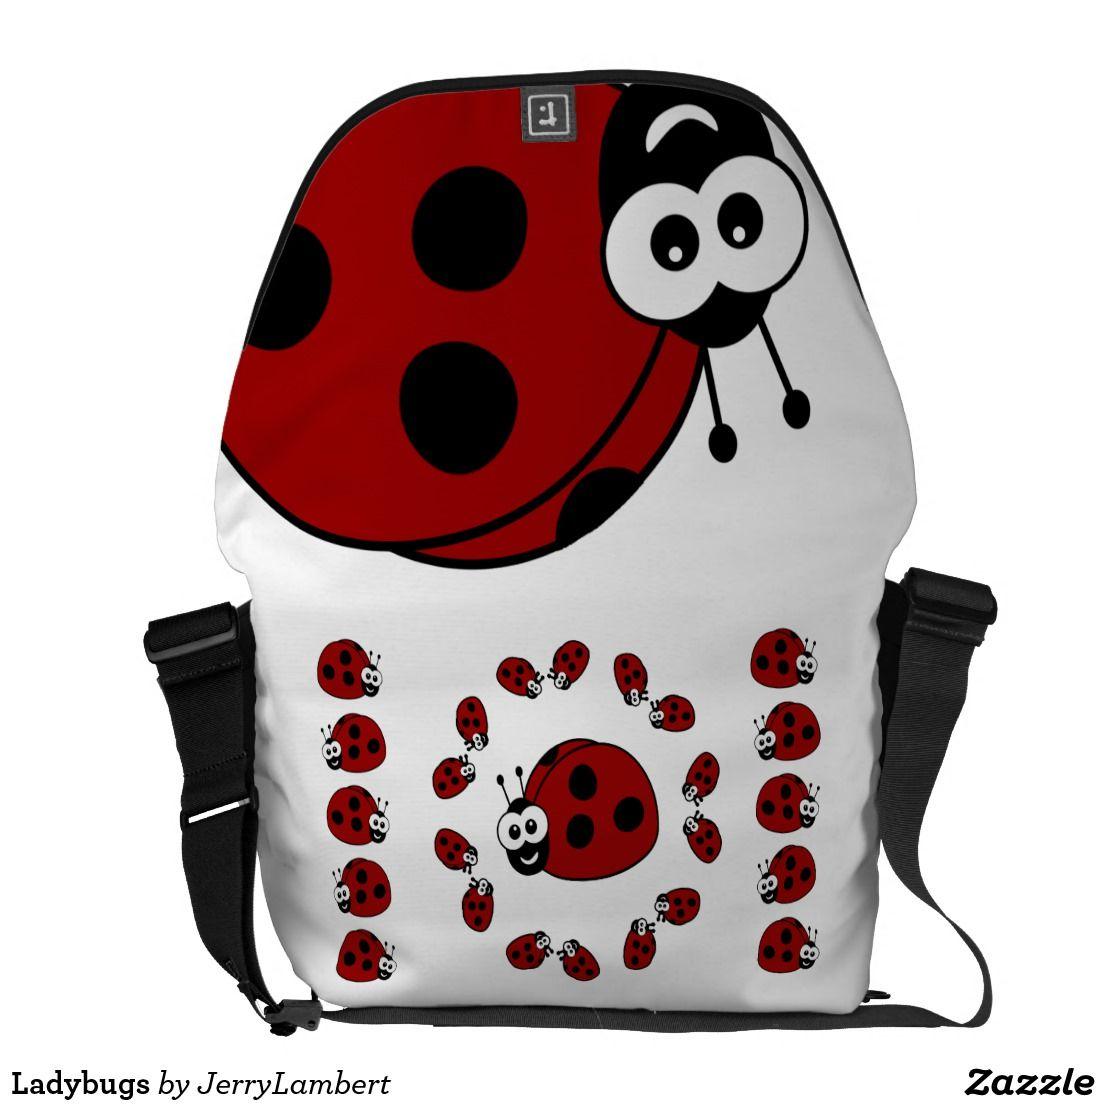 phone toys etc x4 Ladybird Ladybug Stickers car stickers laptop